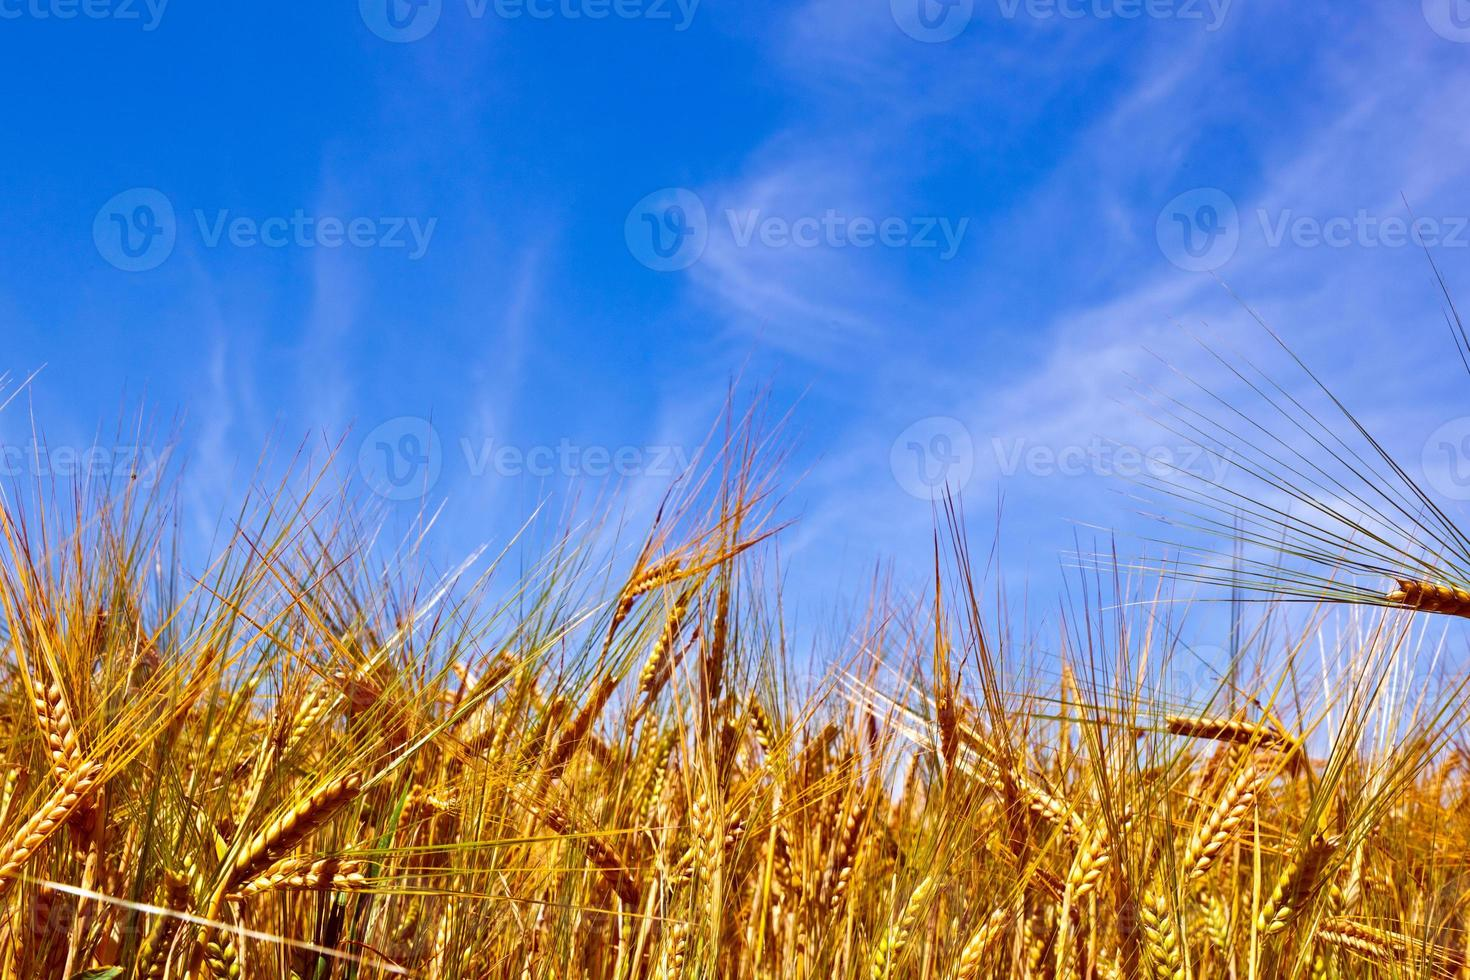 goldenes Getreidefeld mit blauem Himmel foto